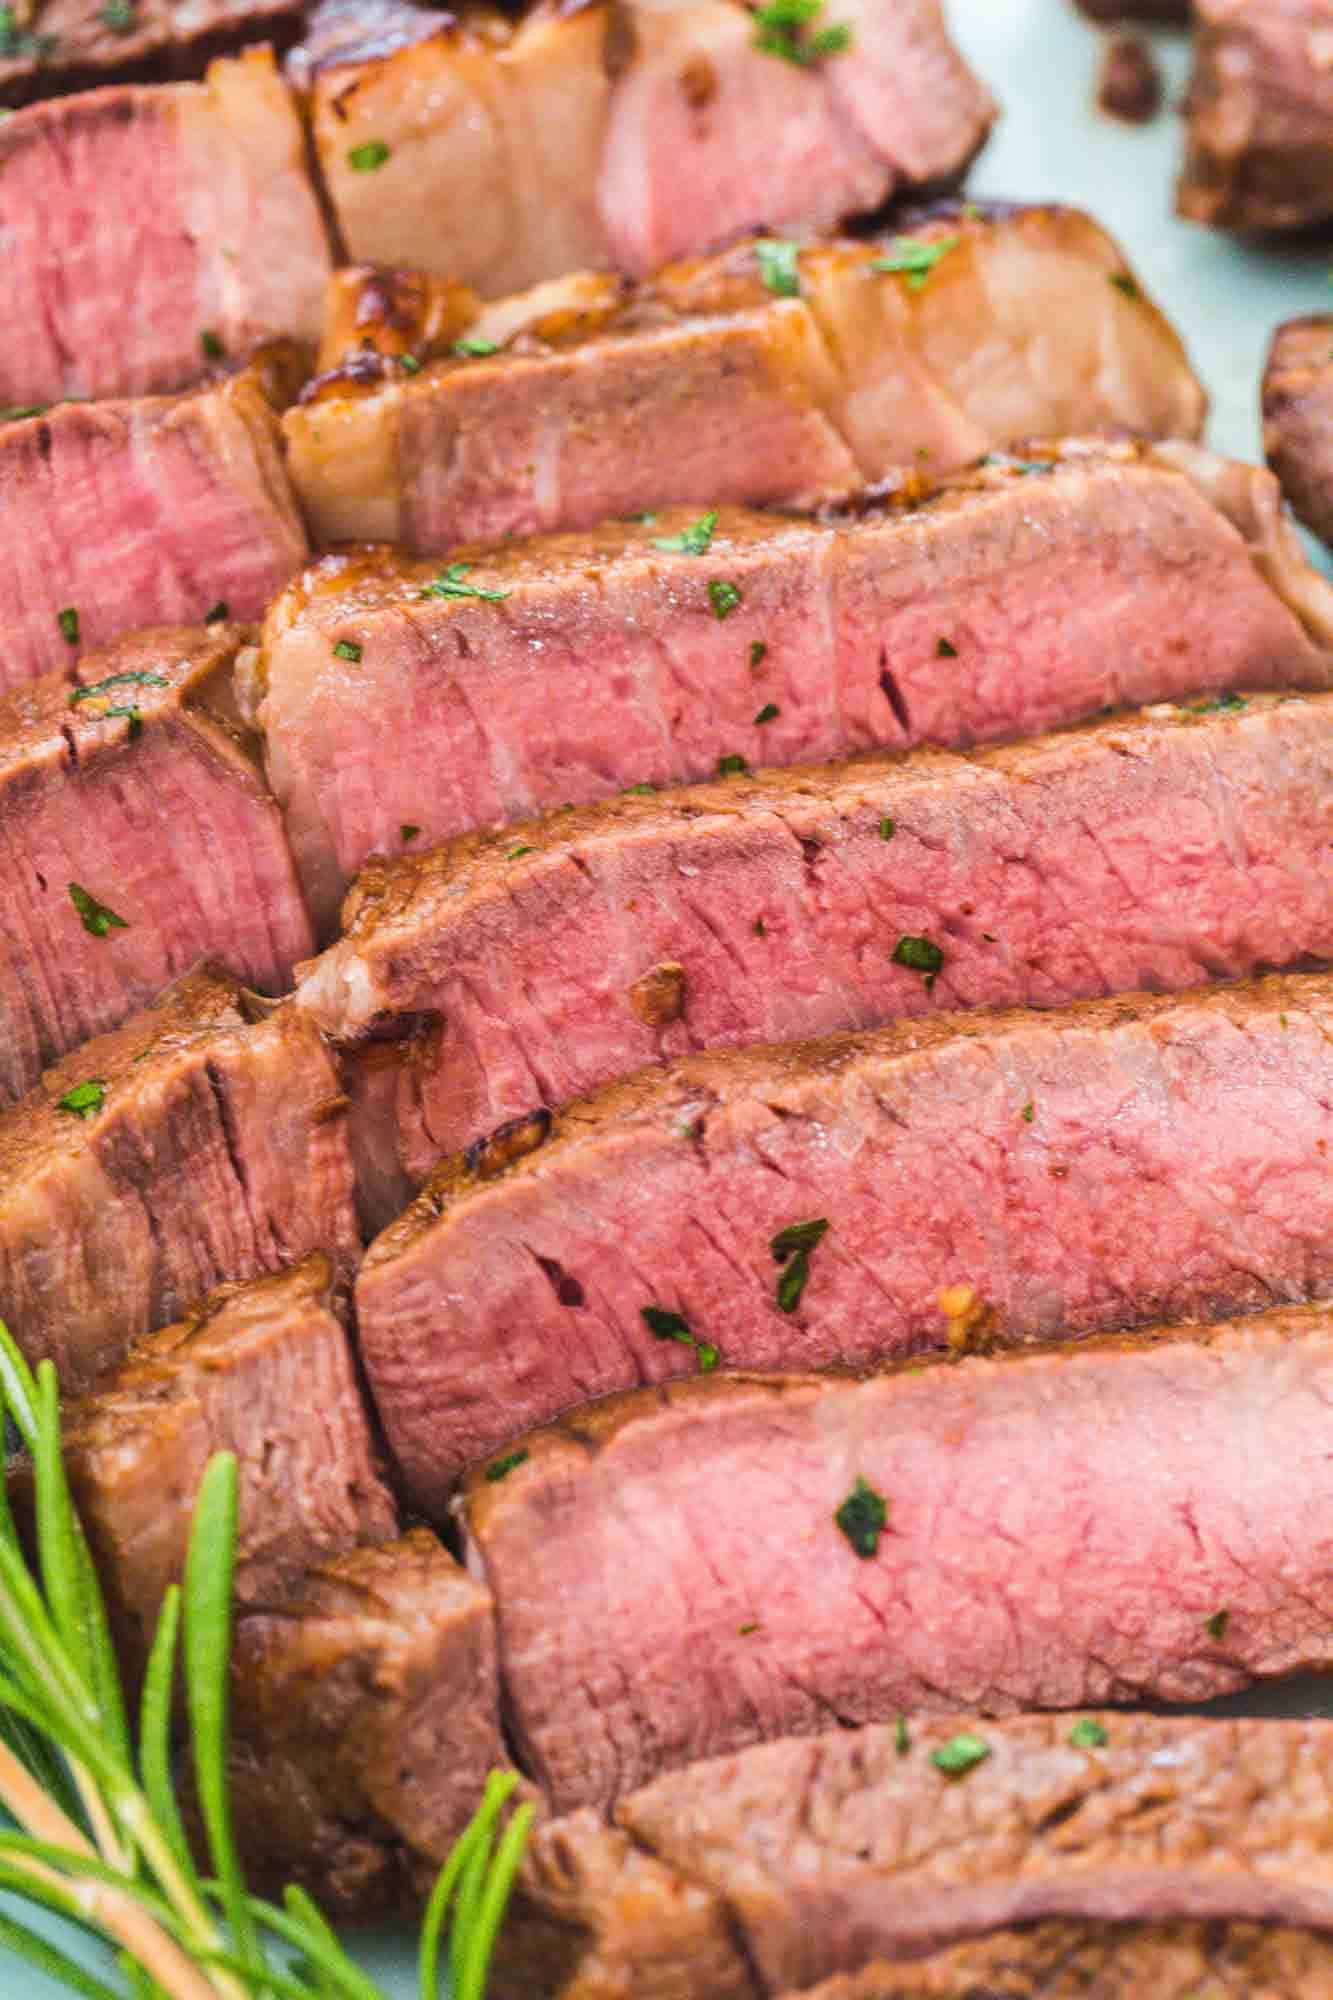 Sliced medium air fried steak on a plate